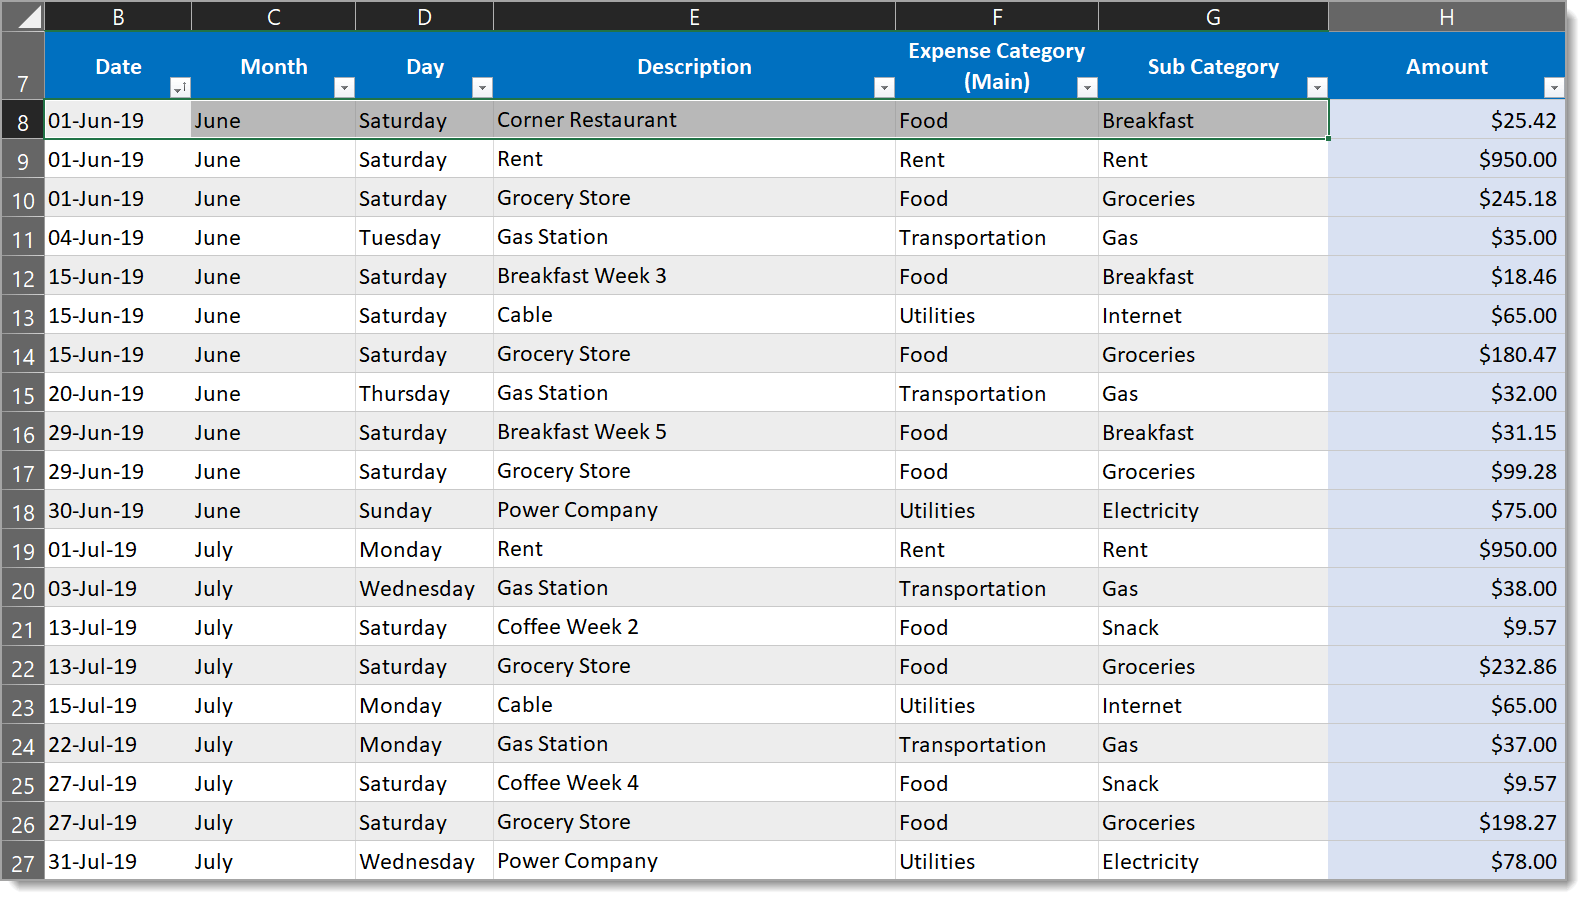 Daily Expense Sheet Sample Data